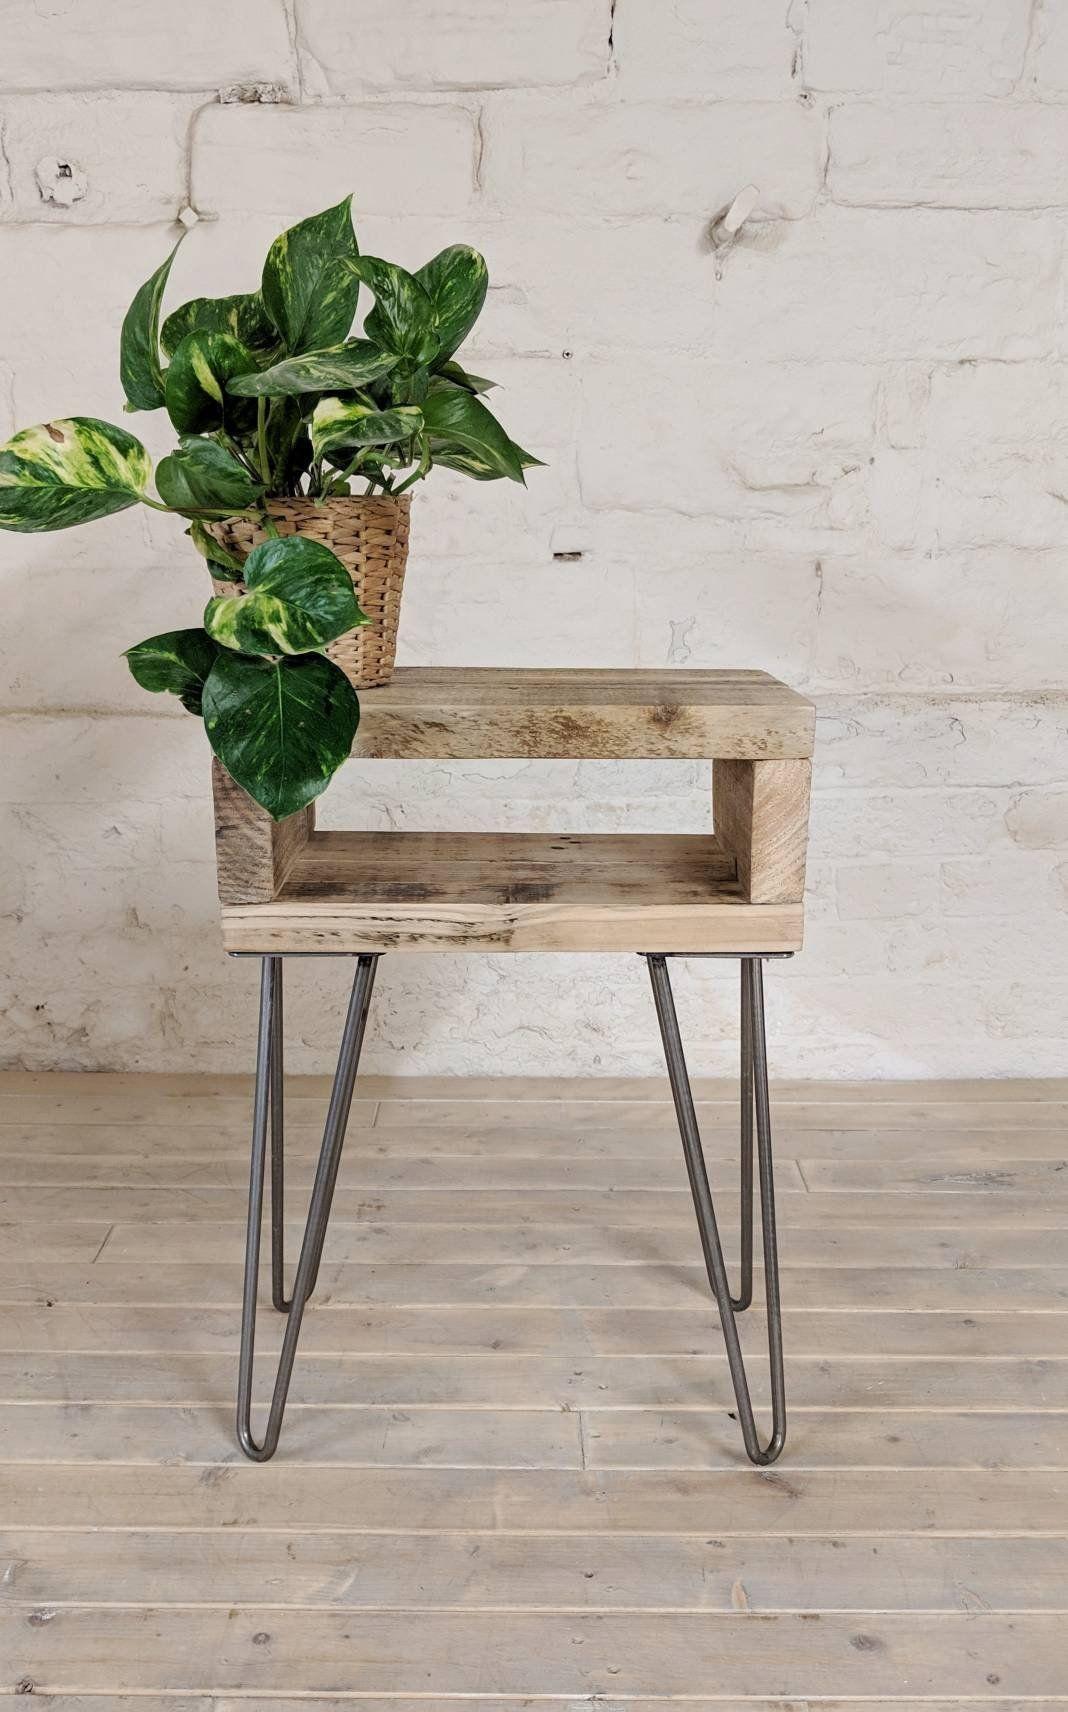 Retro Reclaimed Wood Bedside Table Noa Natural Wood Finish Plant